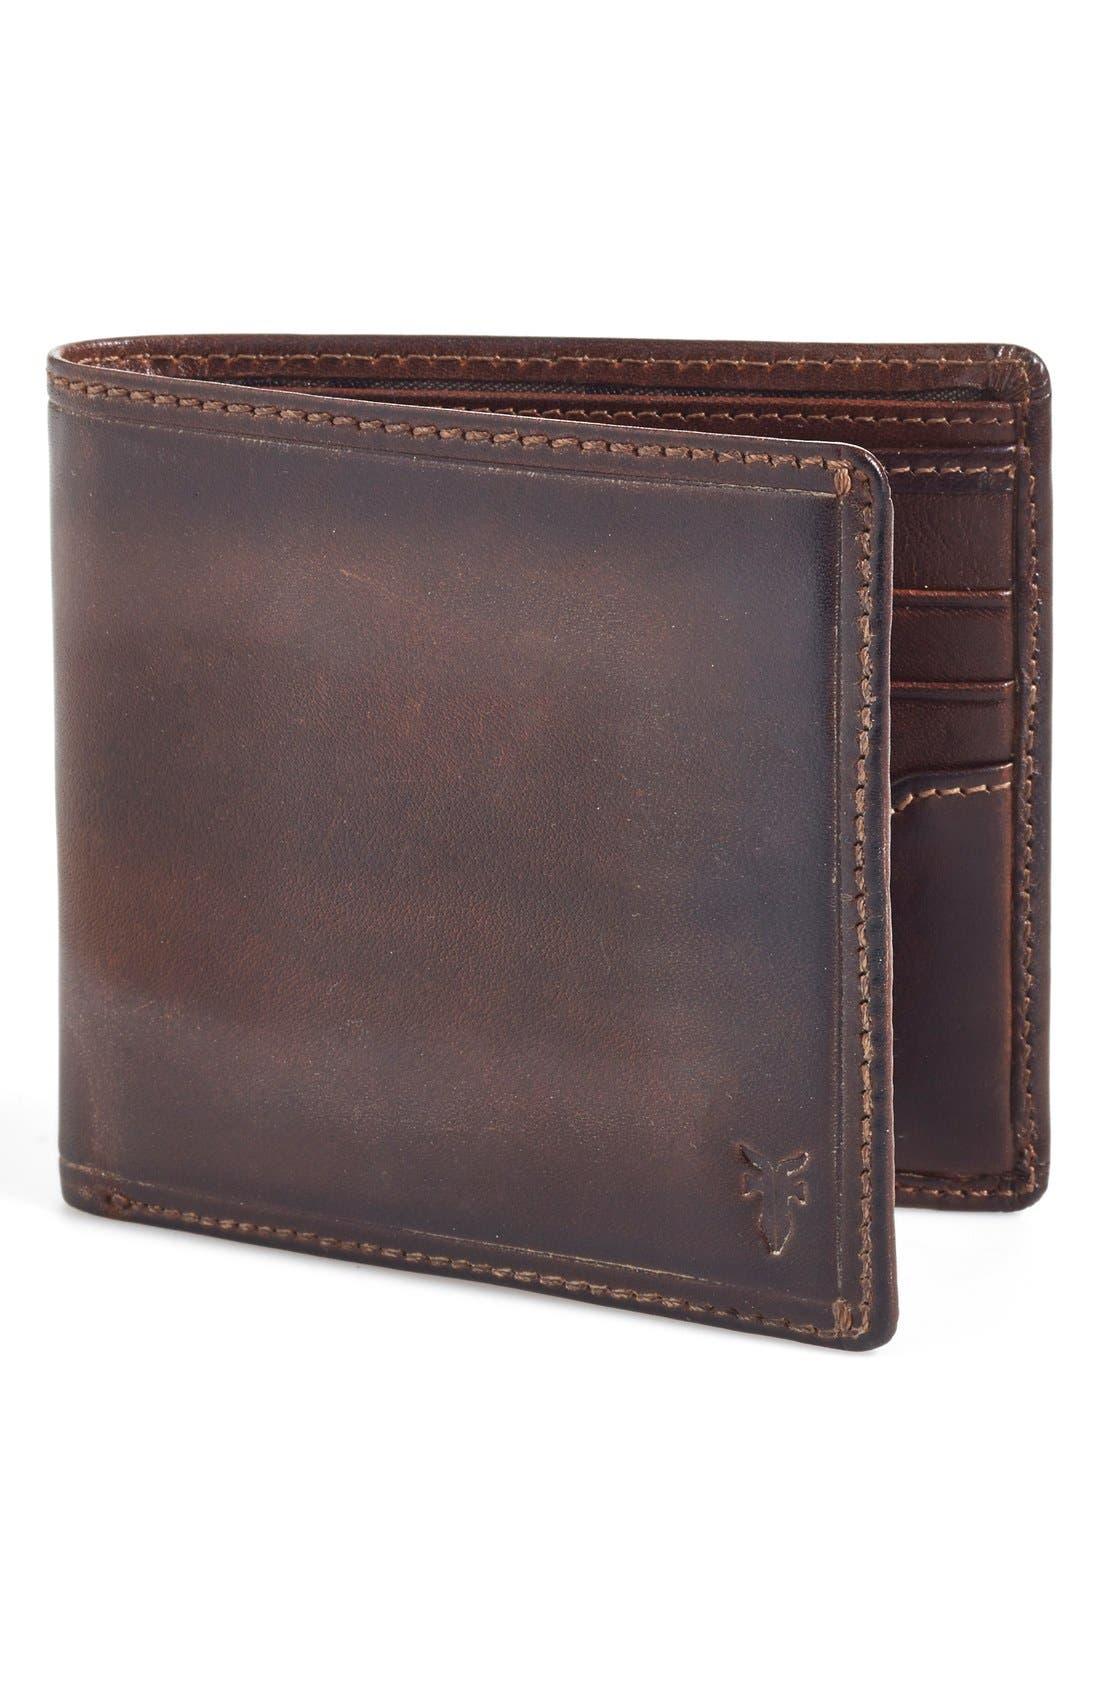 FRYE 'Logan' Leather Billfold Wallet, Main, color, SLATE